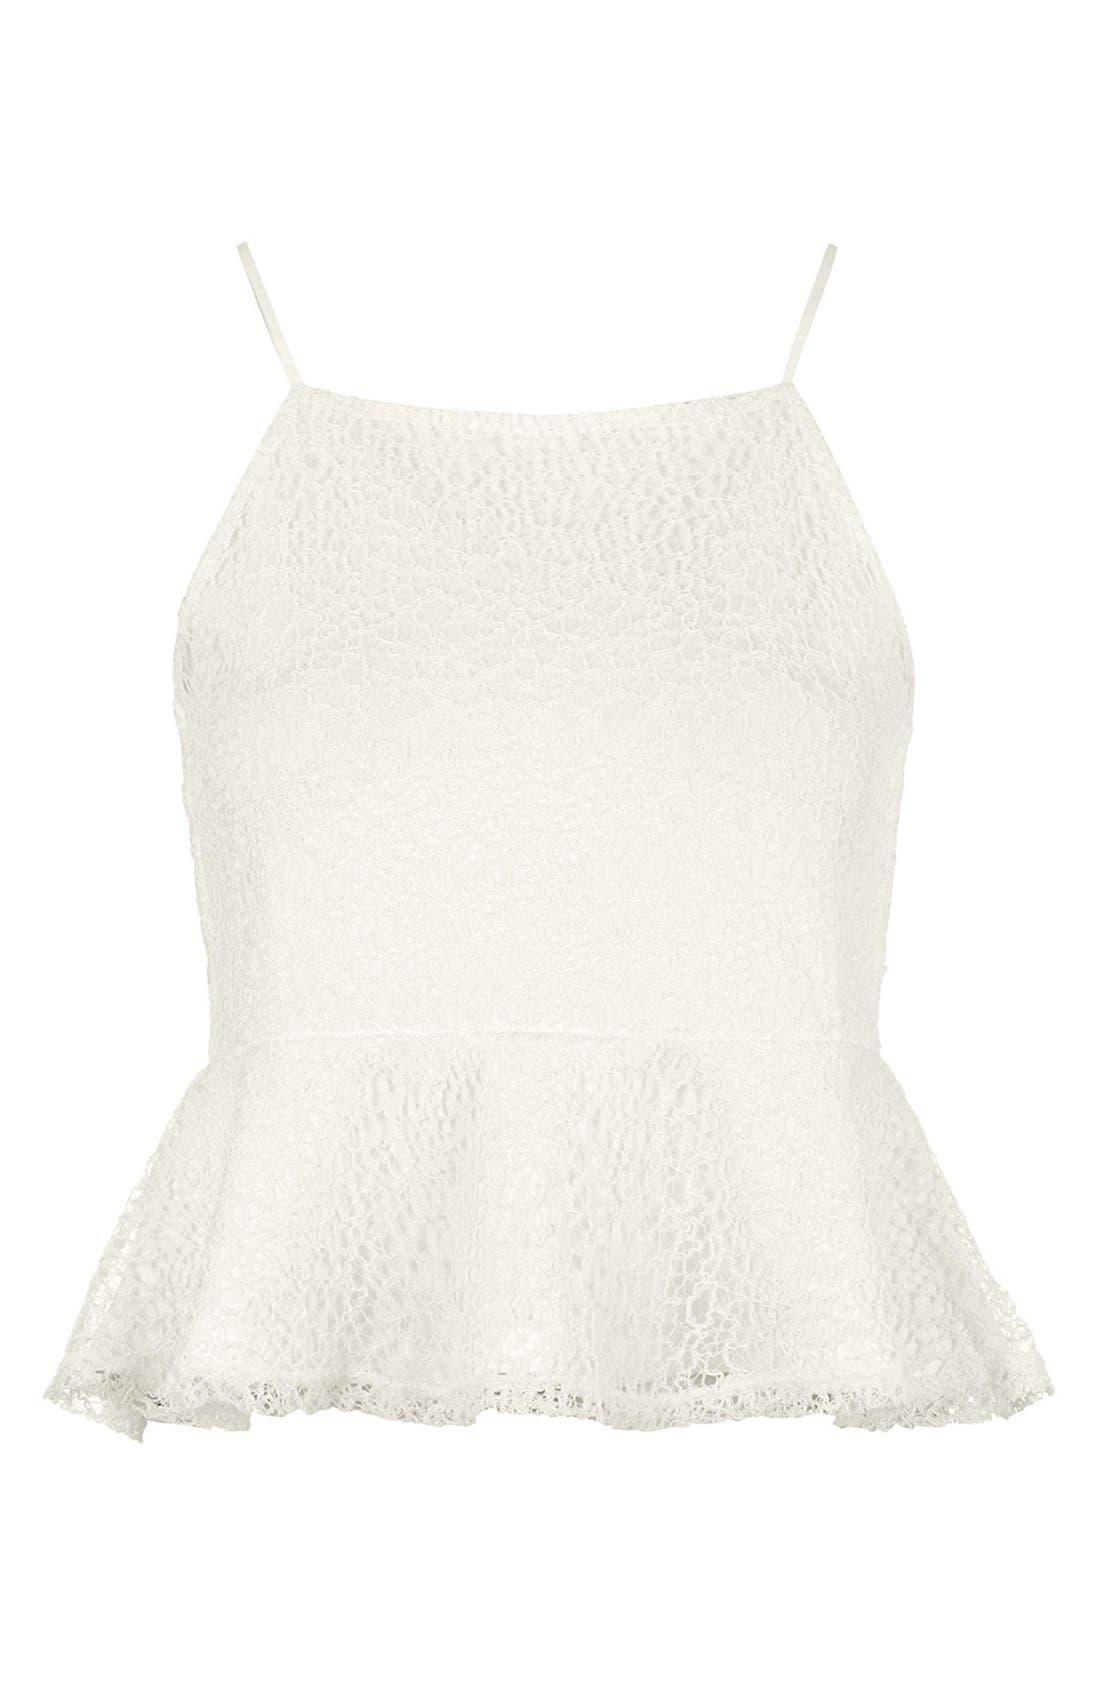 Alternate Image 3  - Topshop Lace Peplum Camisole